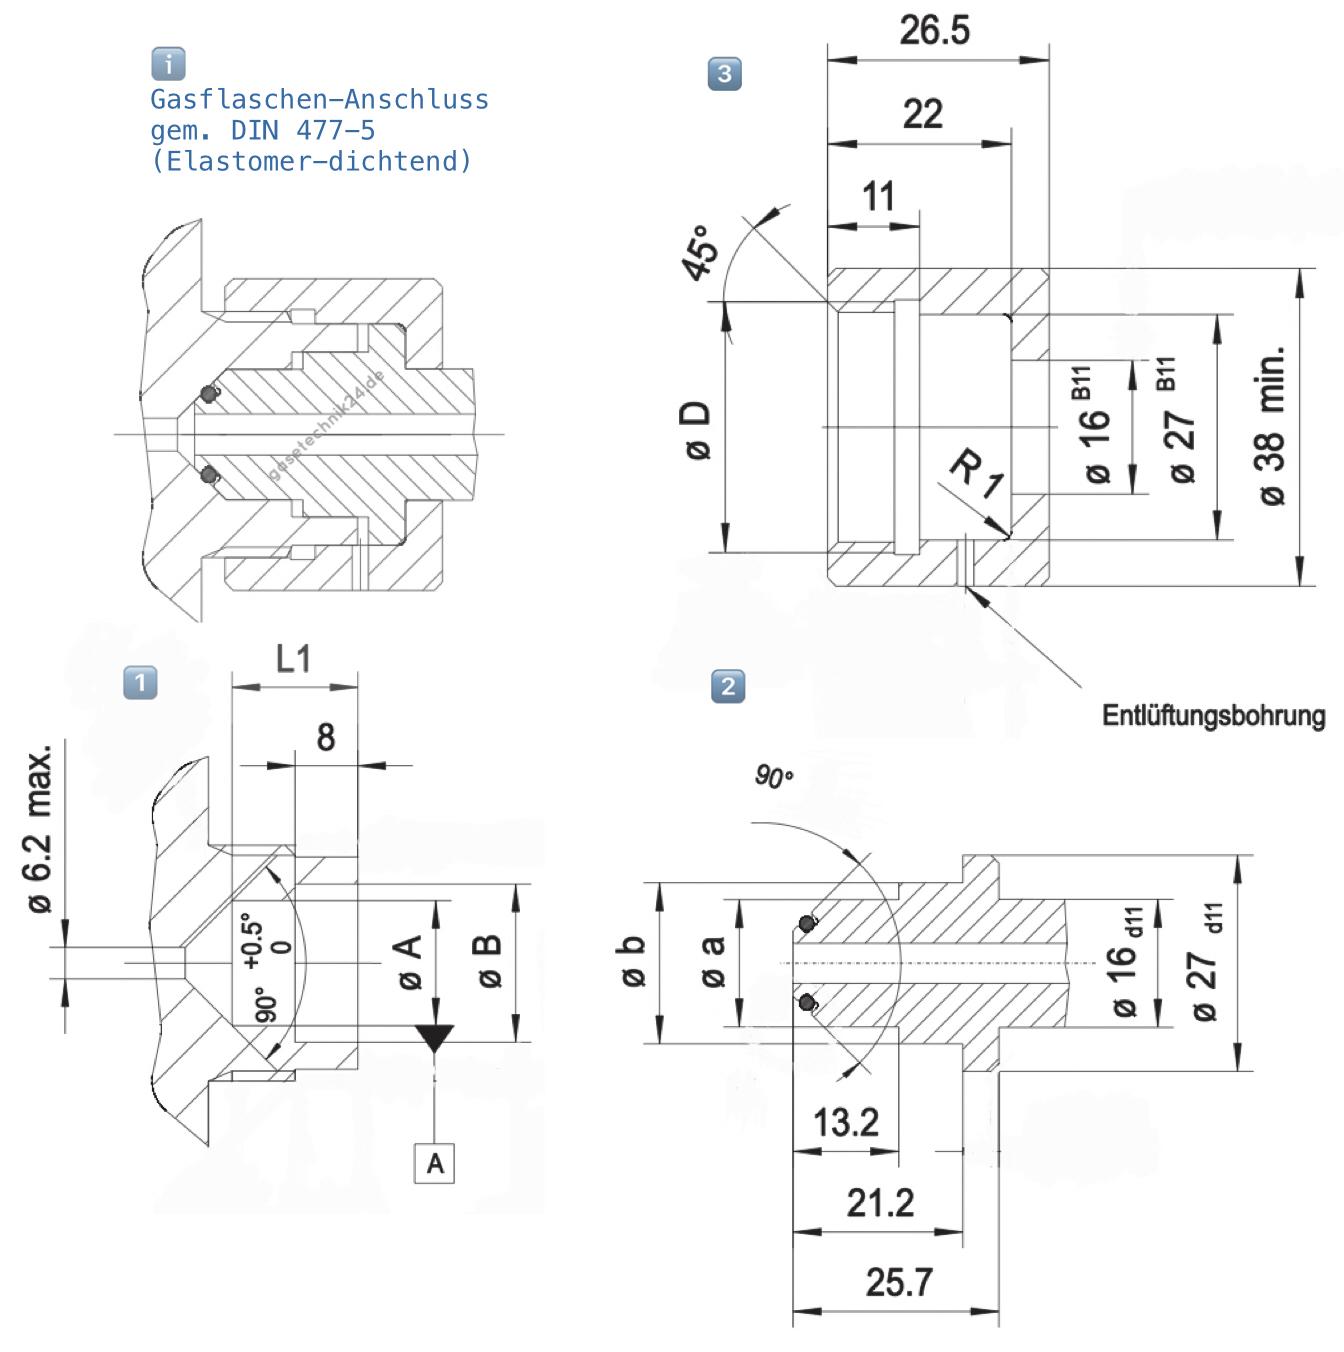 Flaschenanschluss-DIN-477-5-elastomer-dichtend